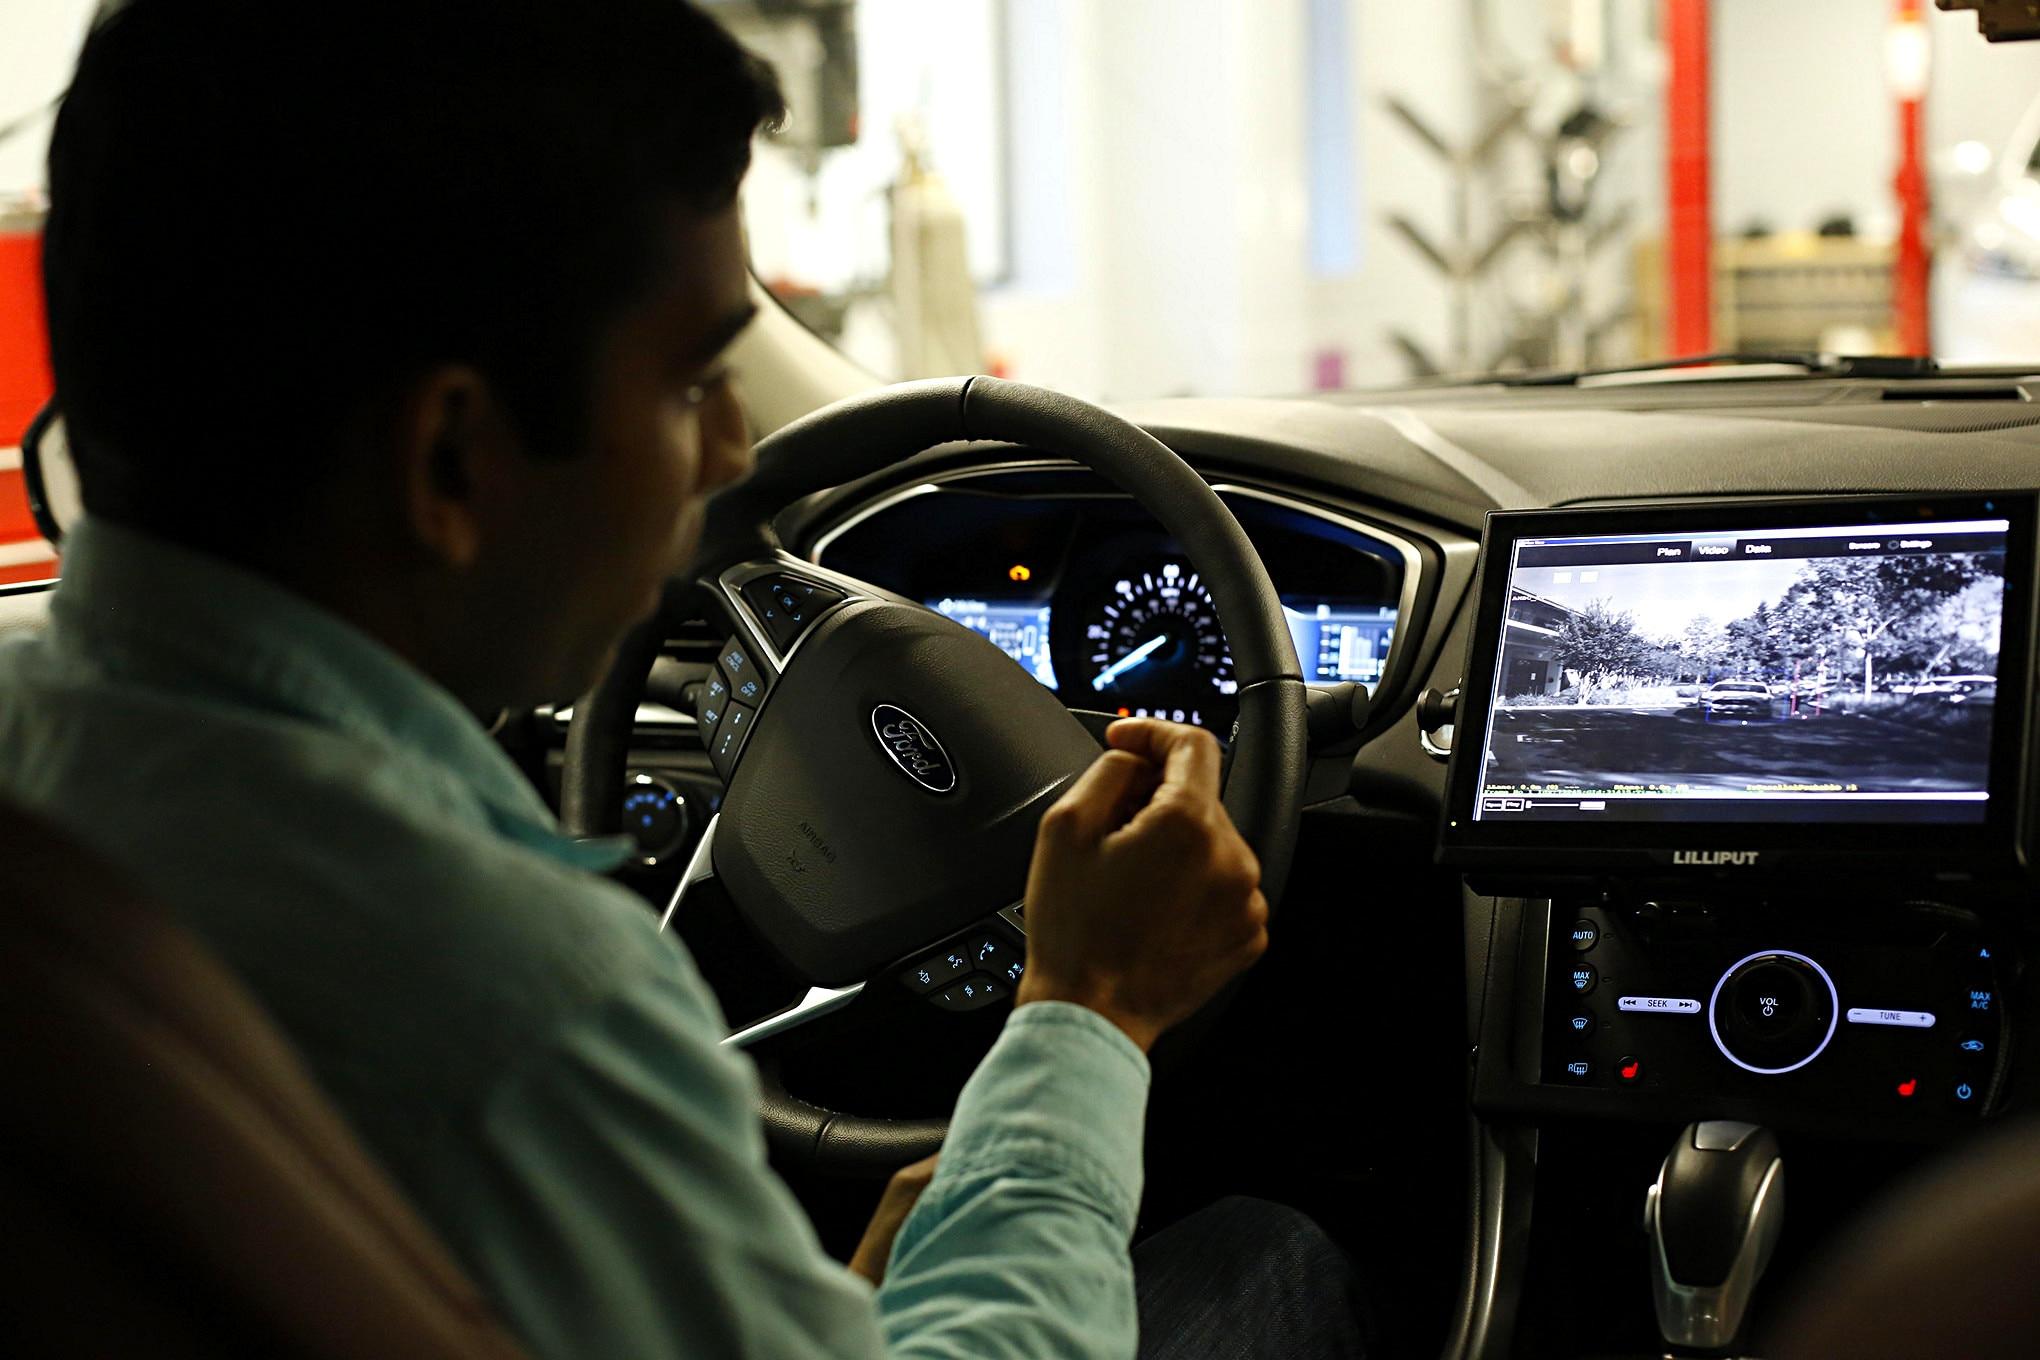 auto news four wheeler autonomous self driving vehicle nhtsa department of transportation.JPG